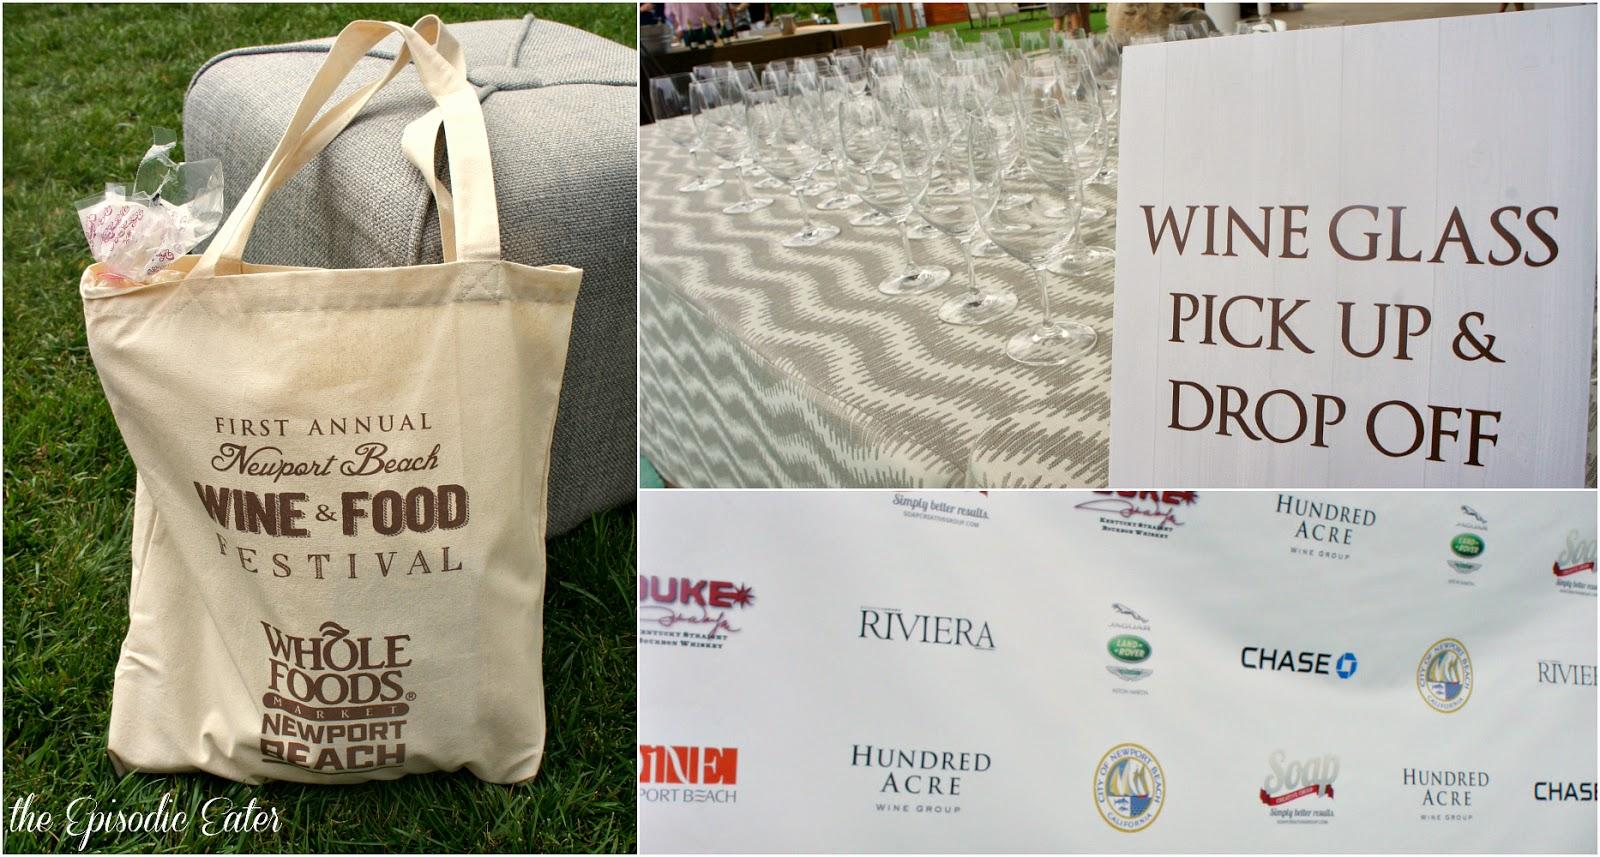 Newport Beach Wine Food Festival (Newport Beach, CA) #1 on The Episodic Eater